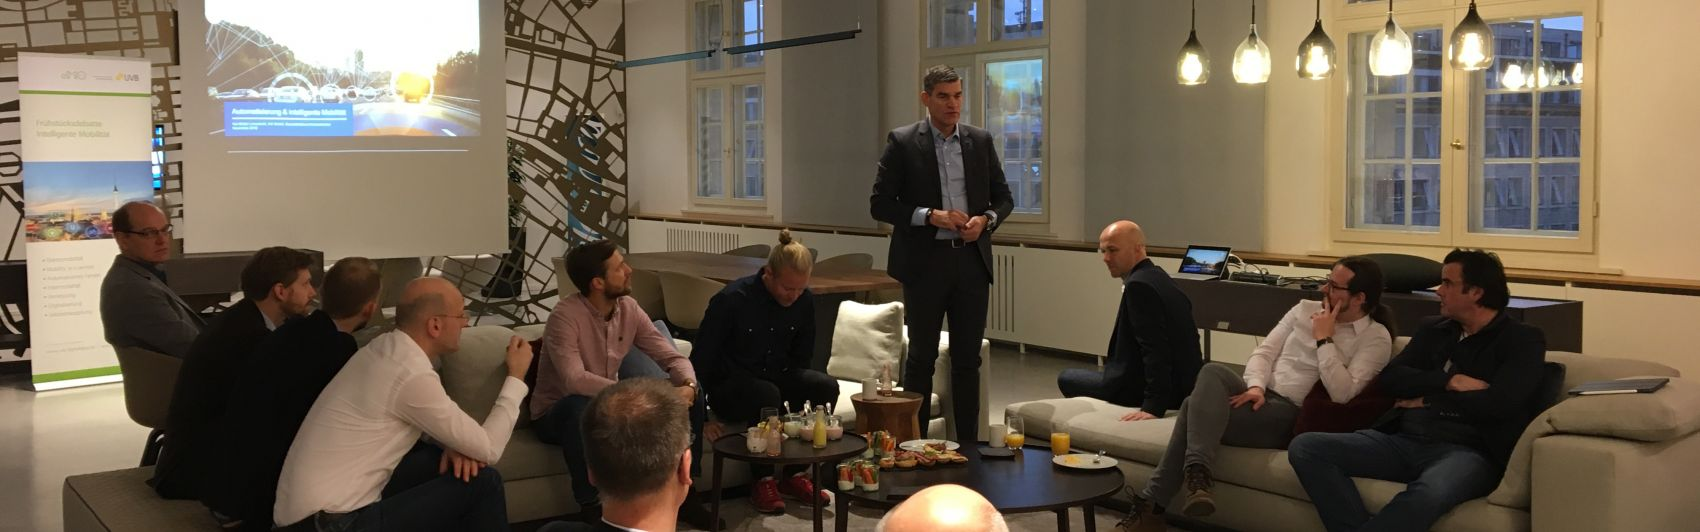 Kai Stefan Linnenkohl, IAV GmbH, eröffnet die 18. Frühstücksdebatte